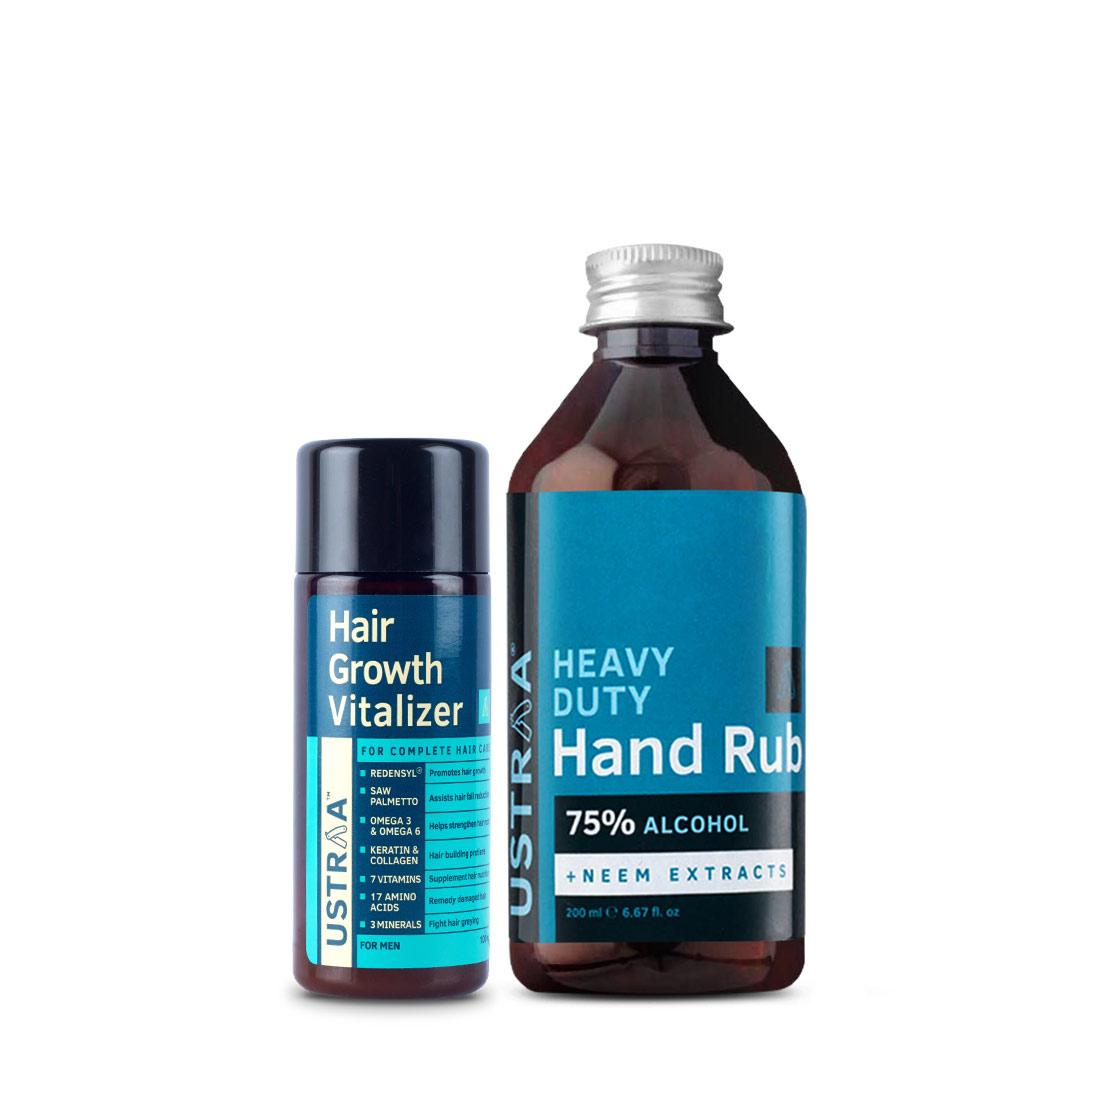 Hair Growth Vitalizer and Hand Rub - 200 ml